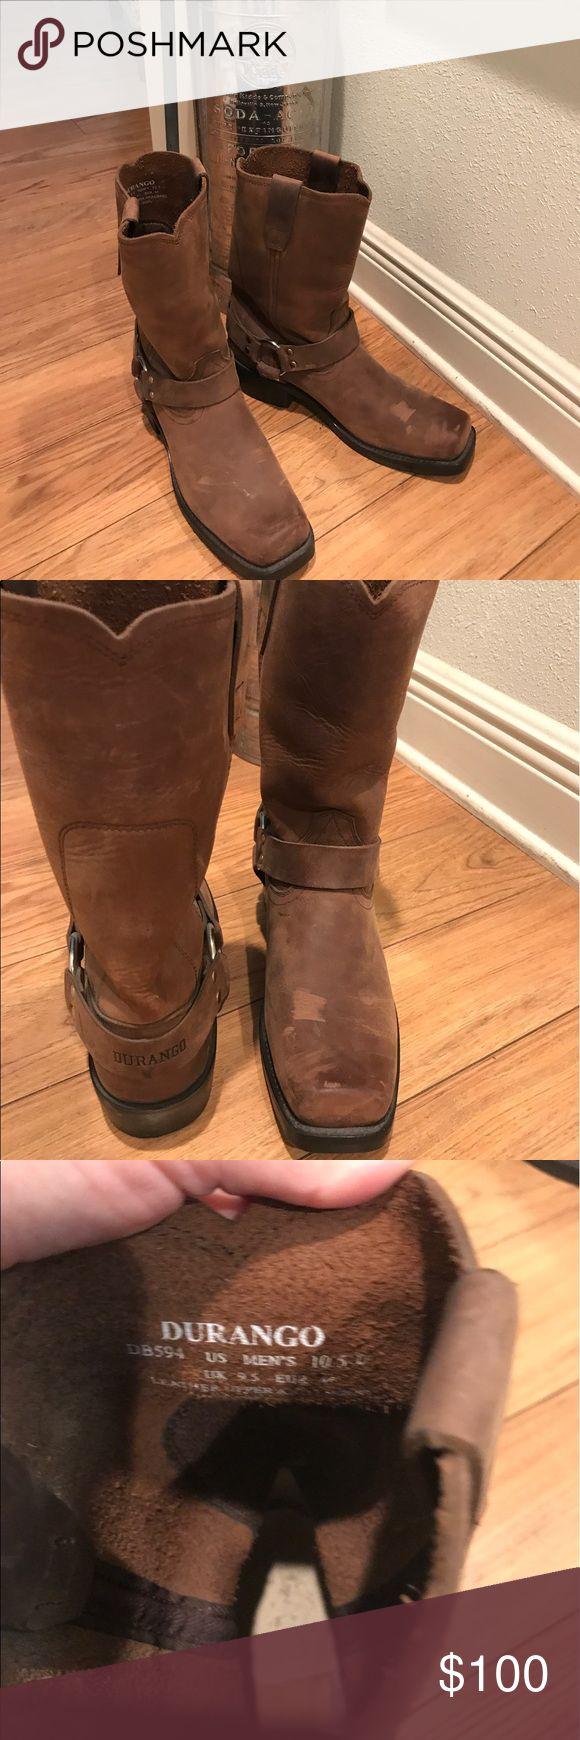 Men's- Durango boots Men's Durango harness boots. Only worn once. Durango Shoes Cowboy & Western Boots